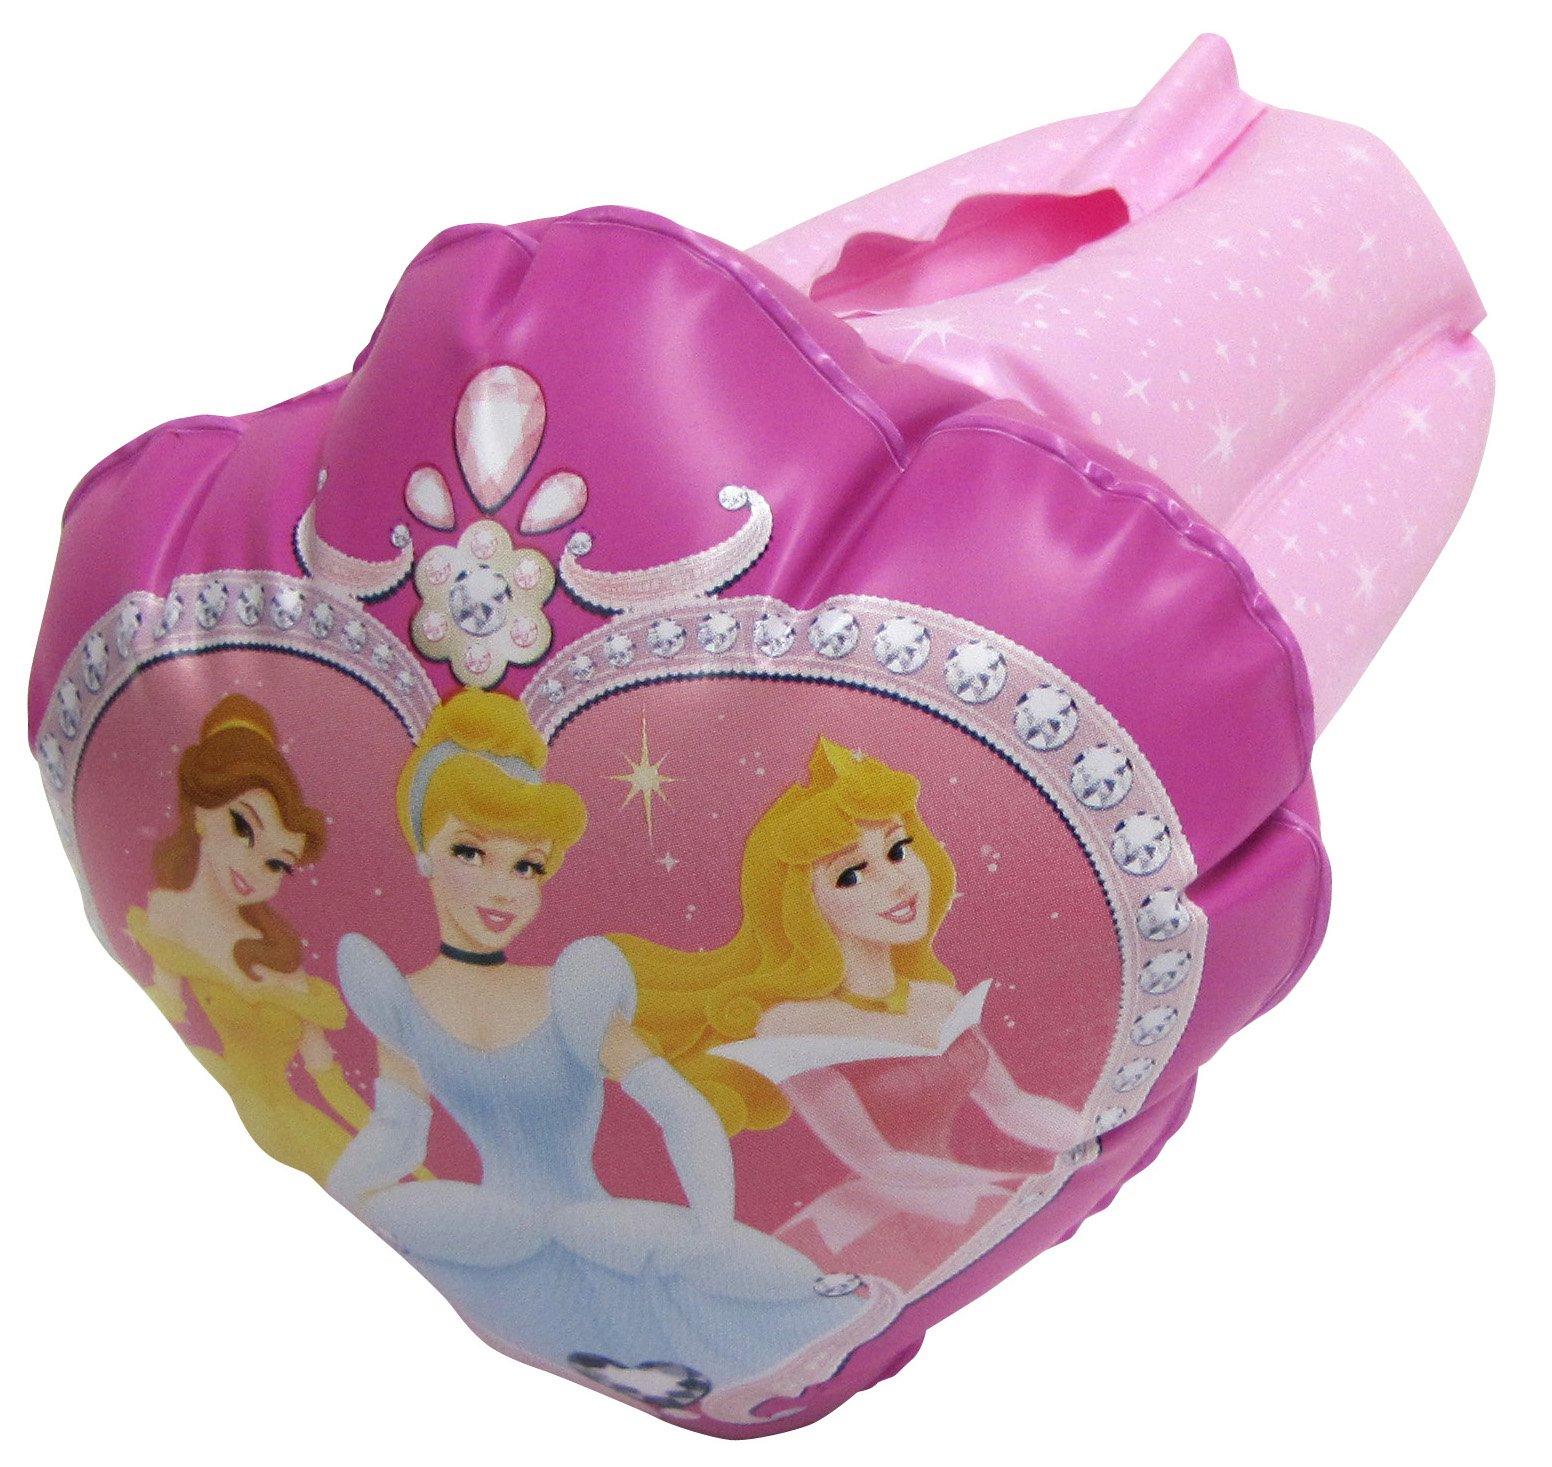 Amazon Com Disney Cars Inflatable Safety Bathtub Bumpers